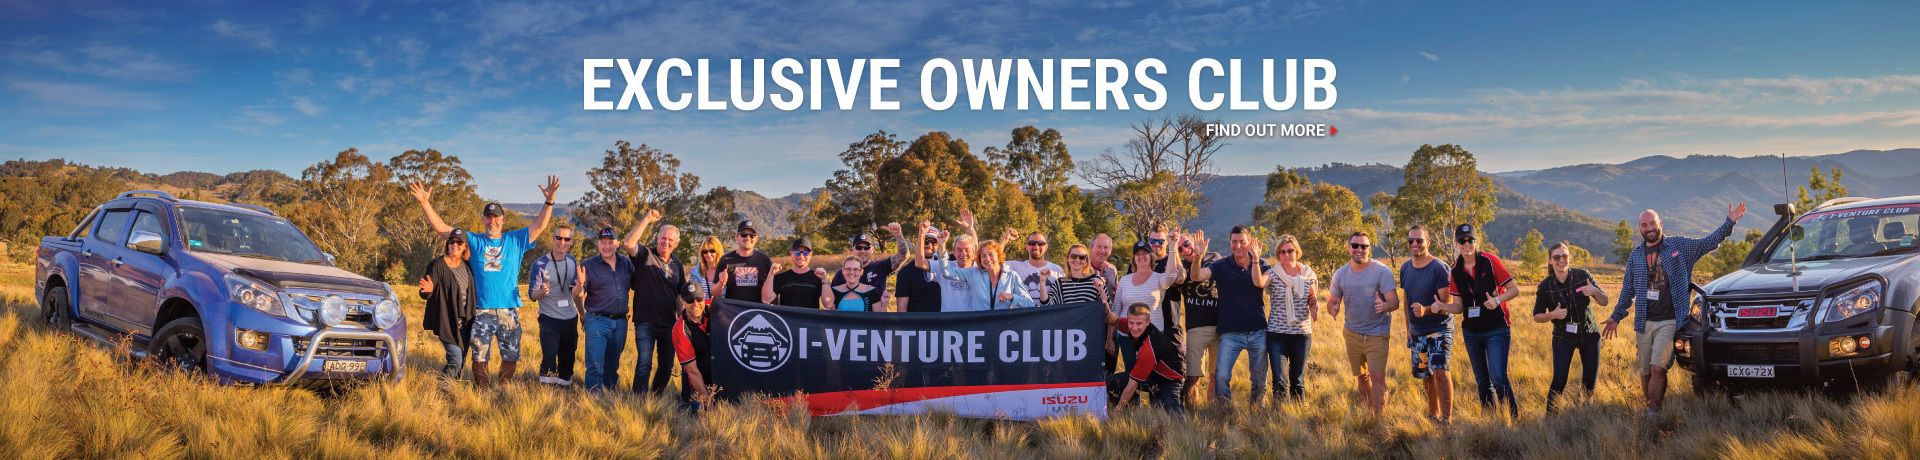 I-Venture Club